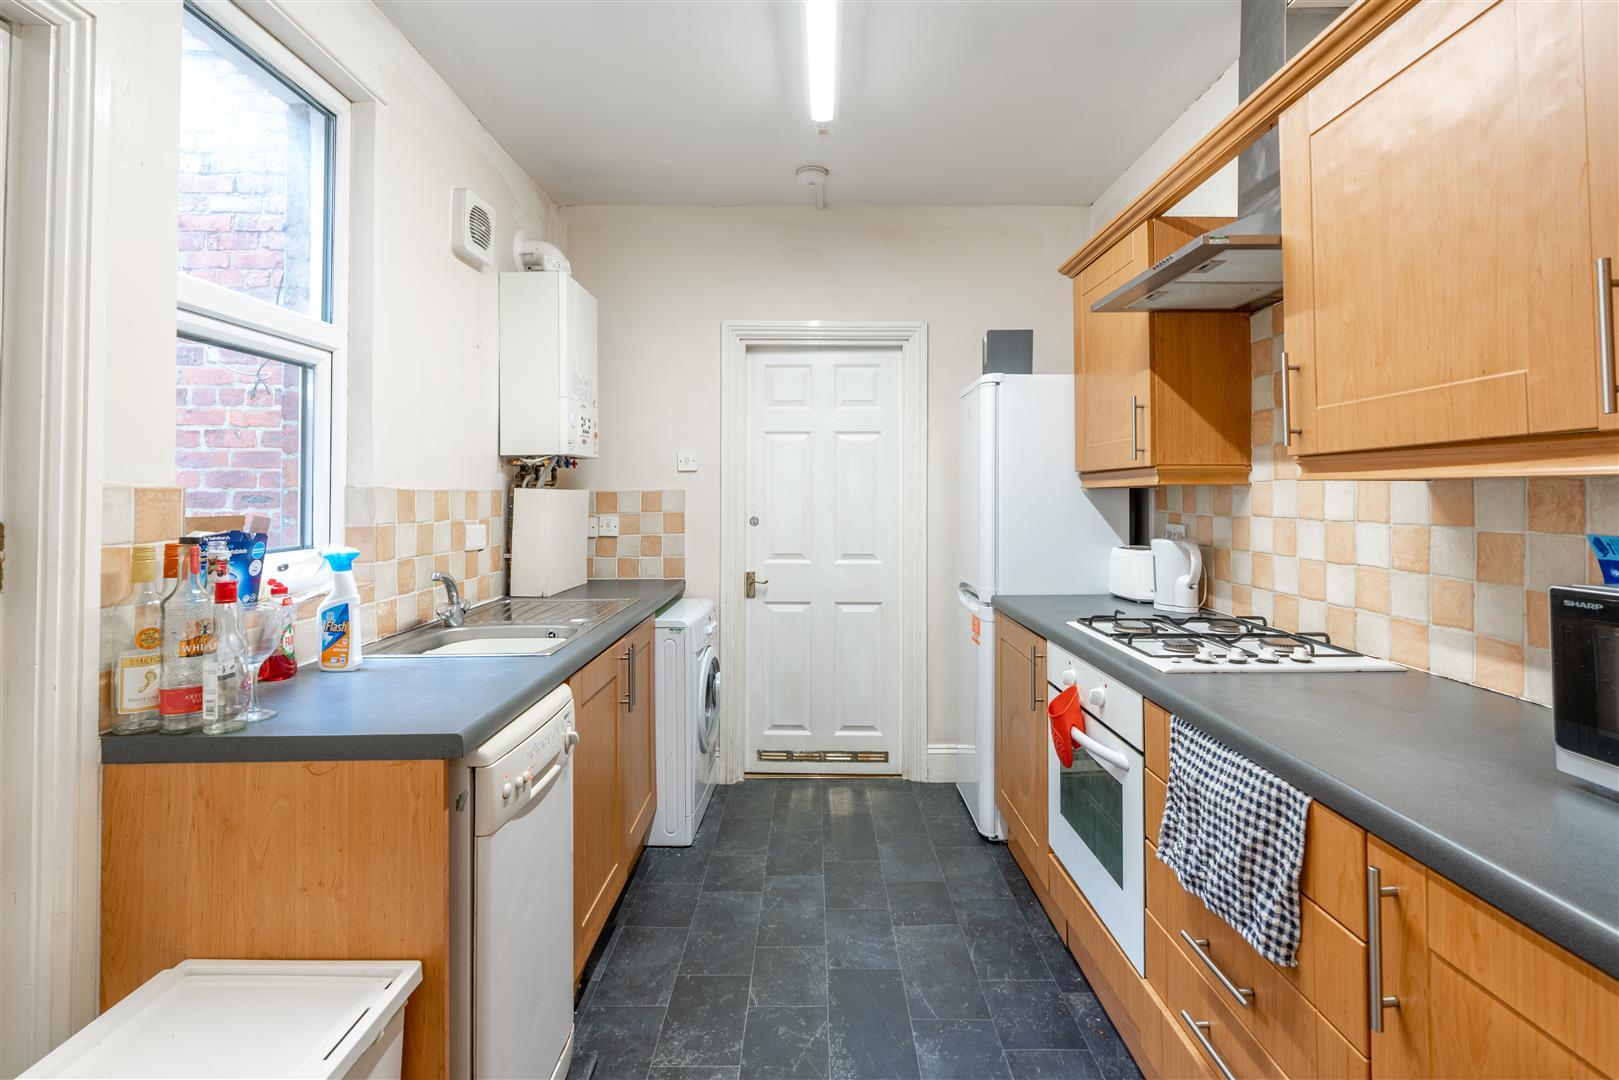 3 bed flat to rent in Tavistock Road, Jesmond, NE2